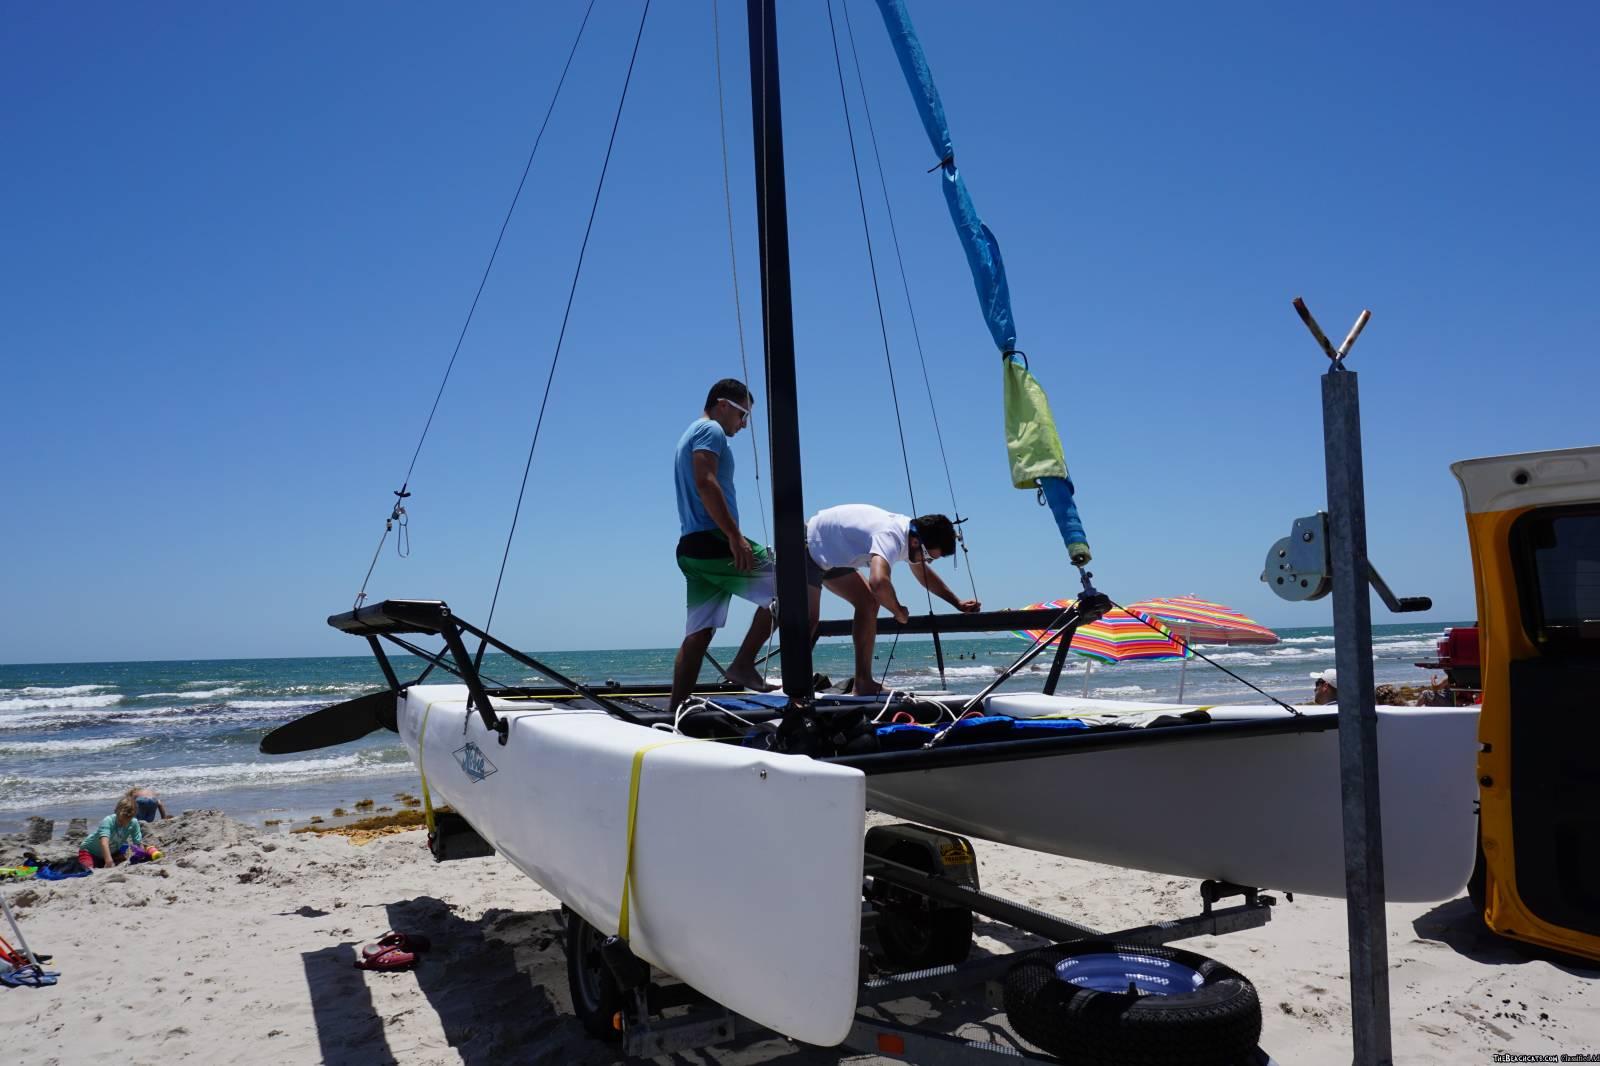 Hobie Getaway - Trailer, New Sails, Trampoline, Trapeze, Zhik harness -  Catamaran Sailboat Classifieds